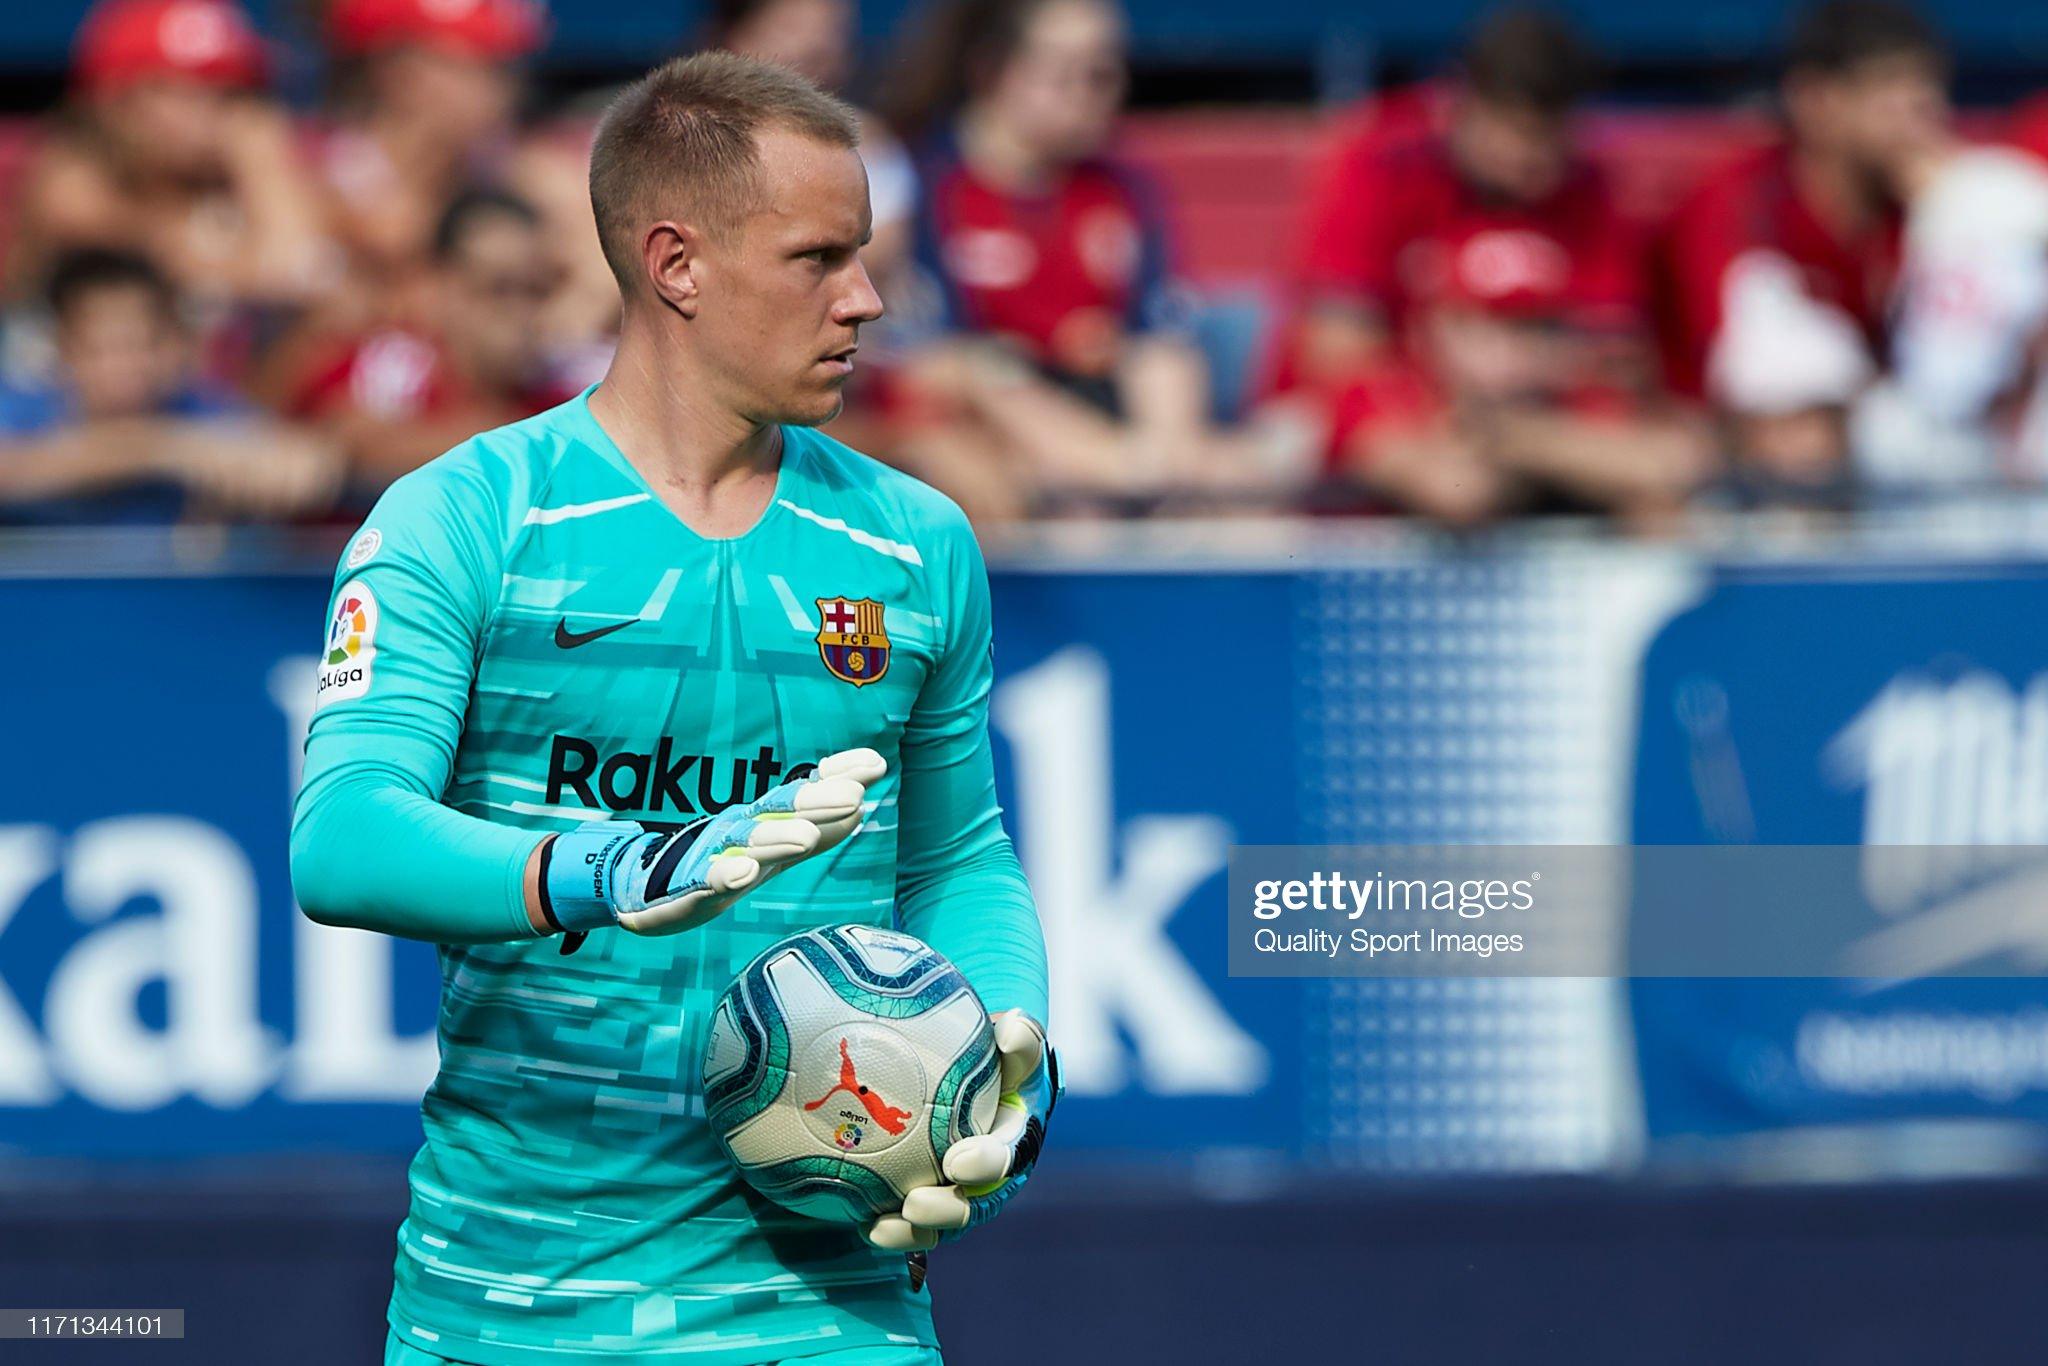 صور مباراة : أوساسونا - برشلونة 2-2 ( 31-08-2019 )  Marcandre-ter-stegen-of-fc-barcelona-looks-on-during-the-liga-match-picture-id1171344101?s=2048x2048